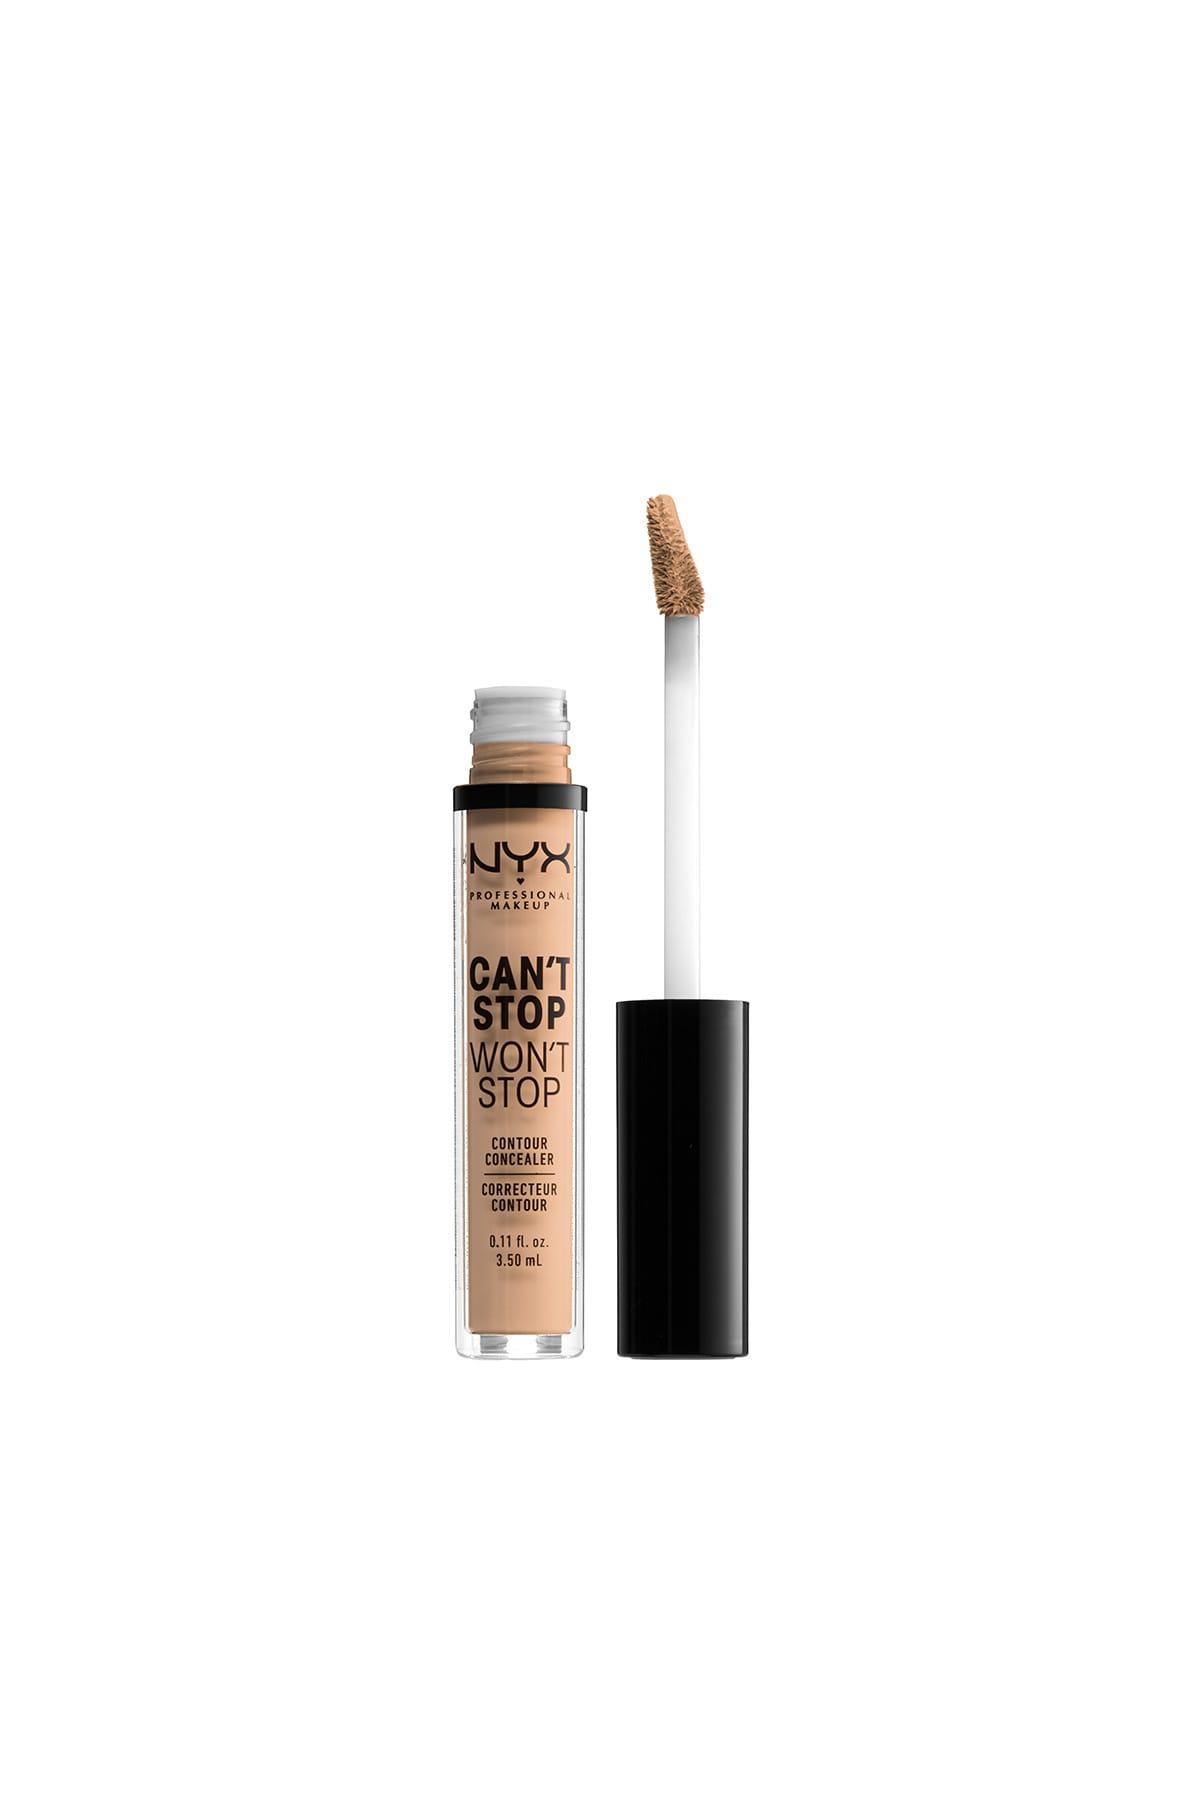 NYX Professional Makeup Kapatıcı - Can't Stop Won't Stop Contour Concealer 7 Natural 3.5 ml 800897168599 2